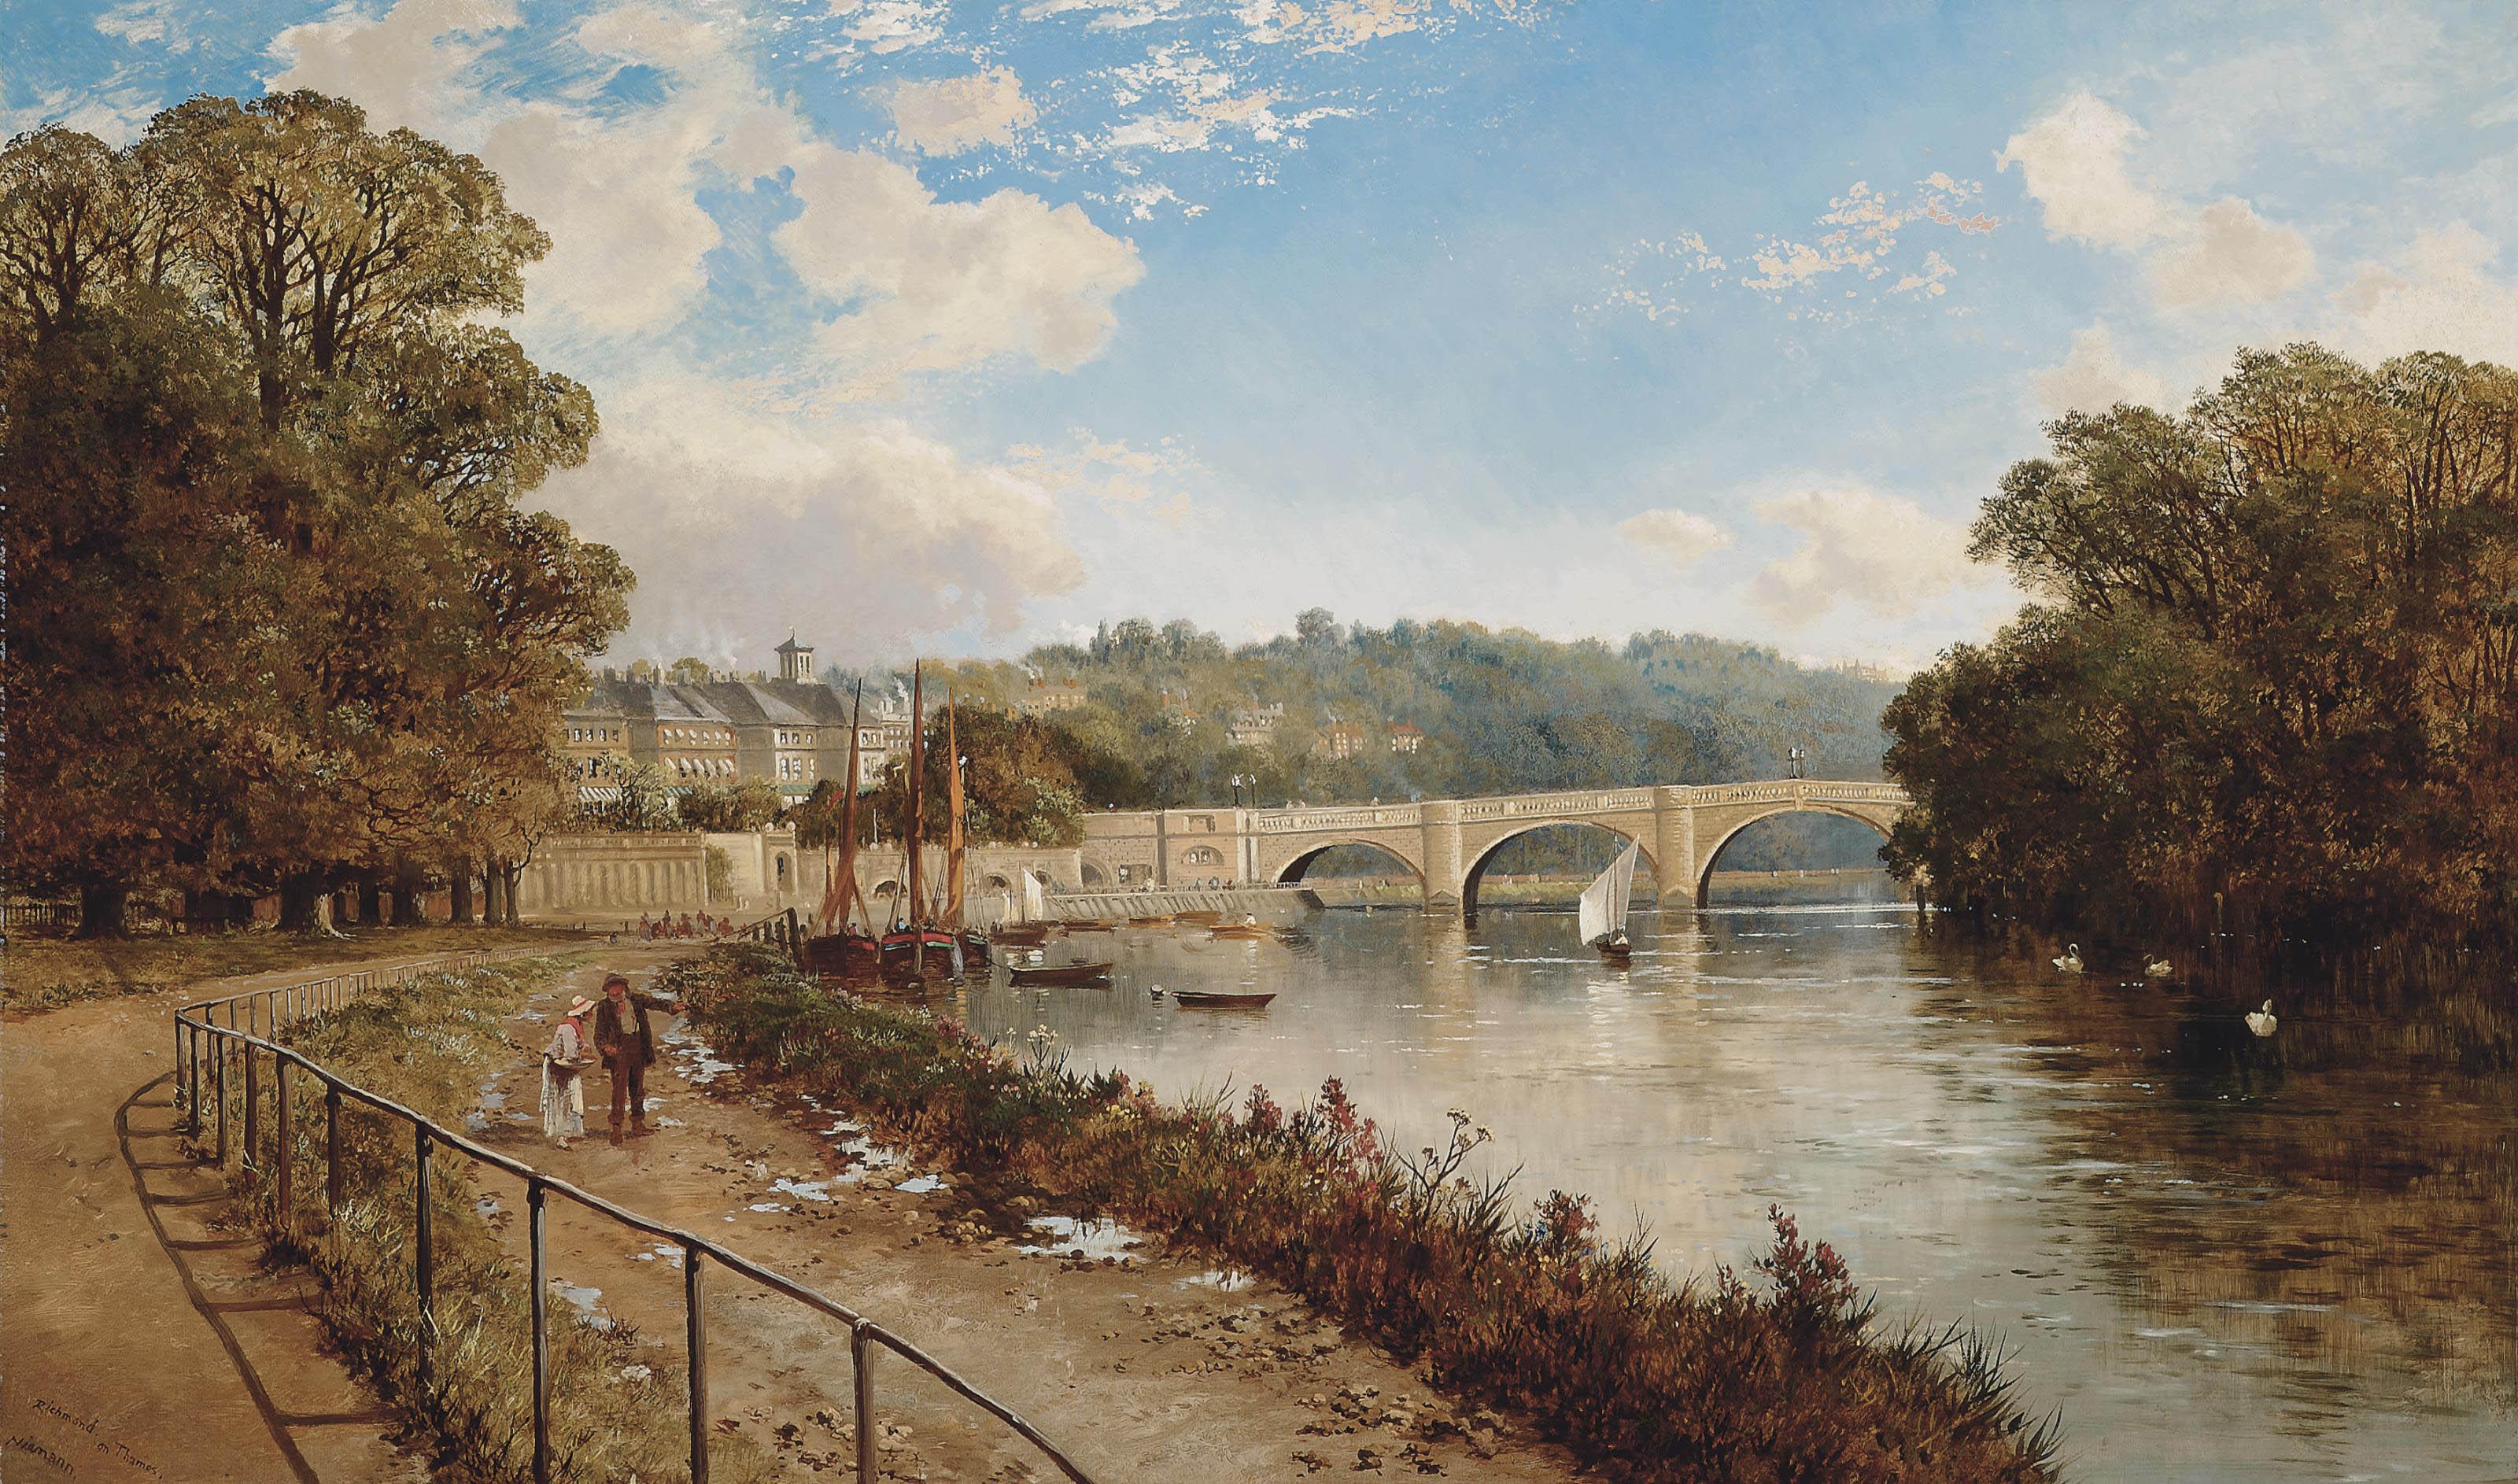 Richmond on Thames